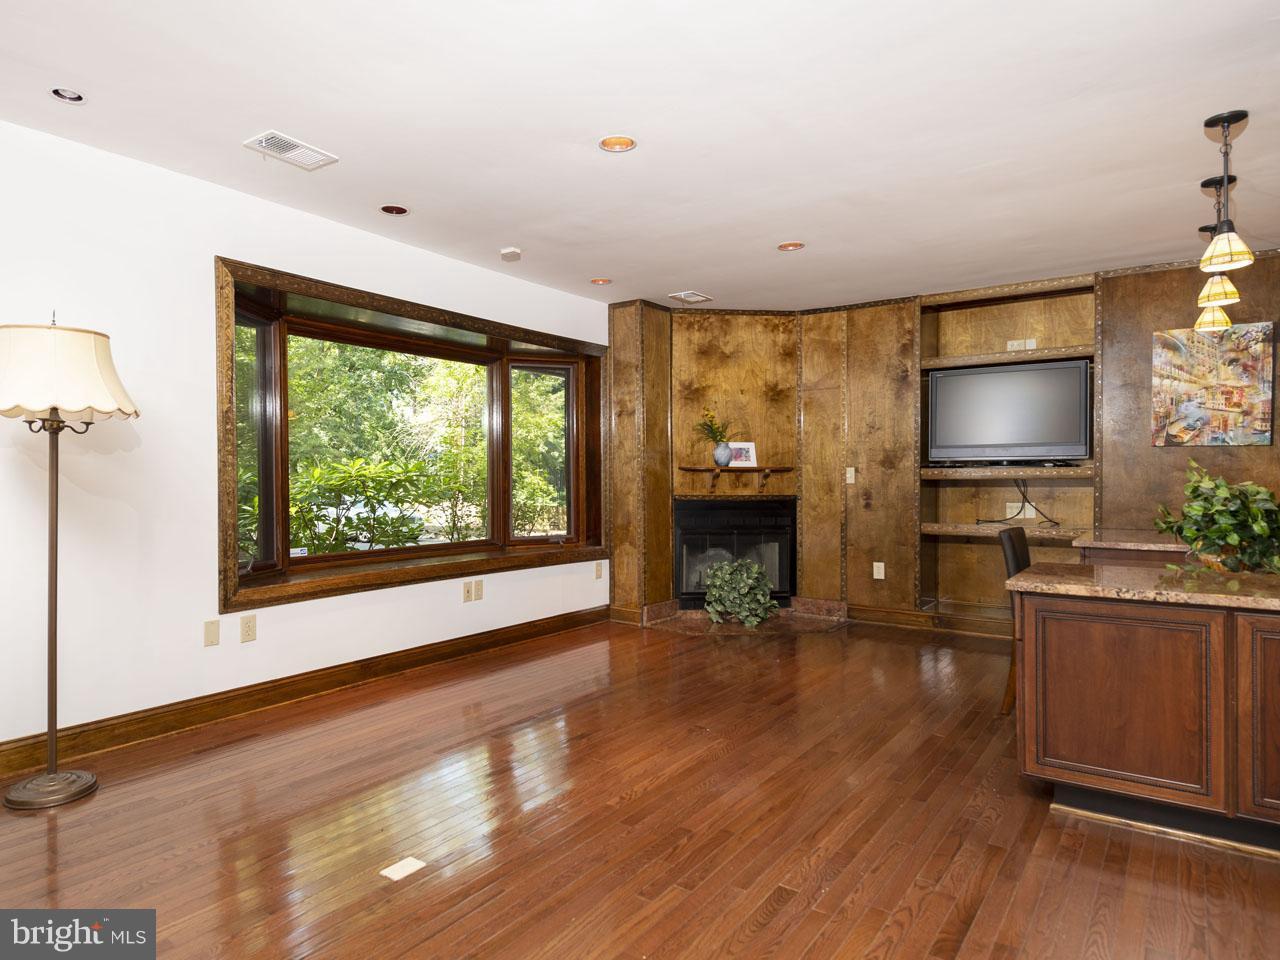 1002303700-300502418962-2021-07-22-03-27-22  |   | Alexandria Delaware Real Estate For Sale | MLS# 1002303700  - Best of Northern Virginia